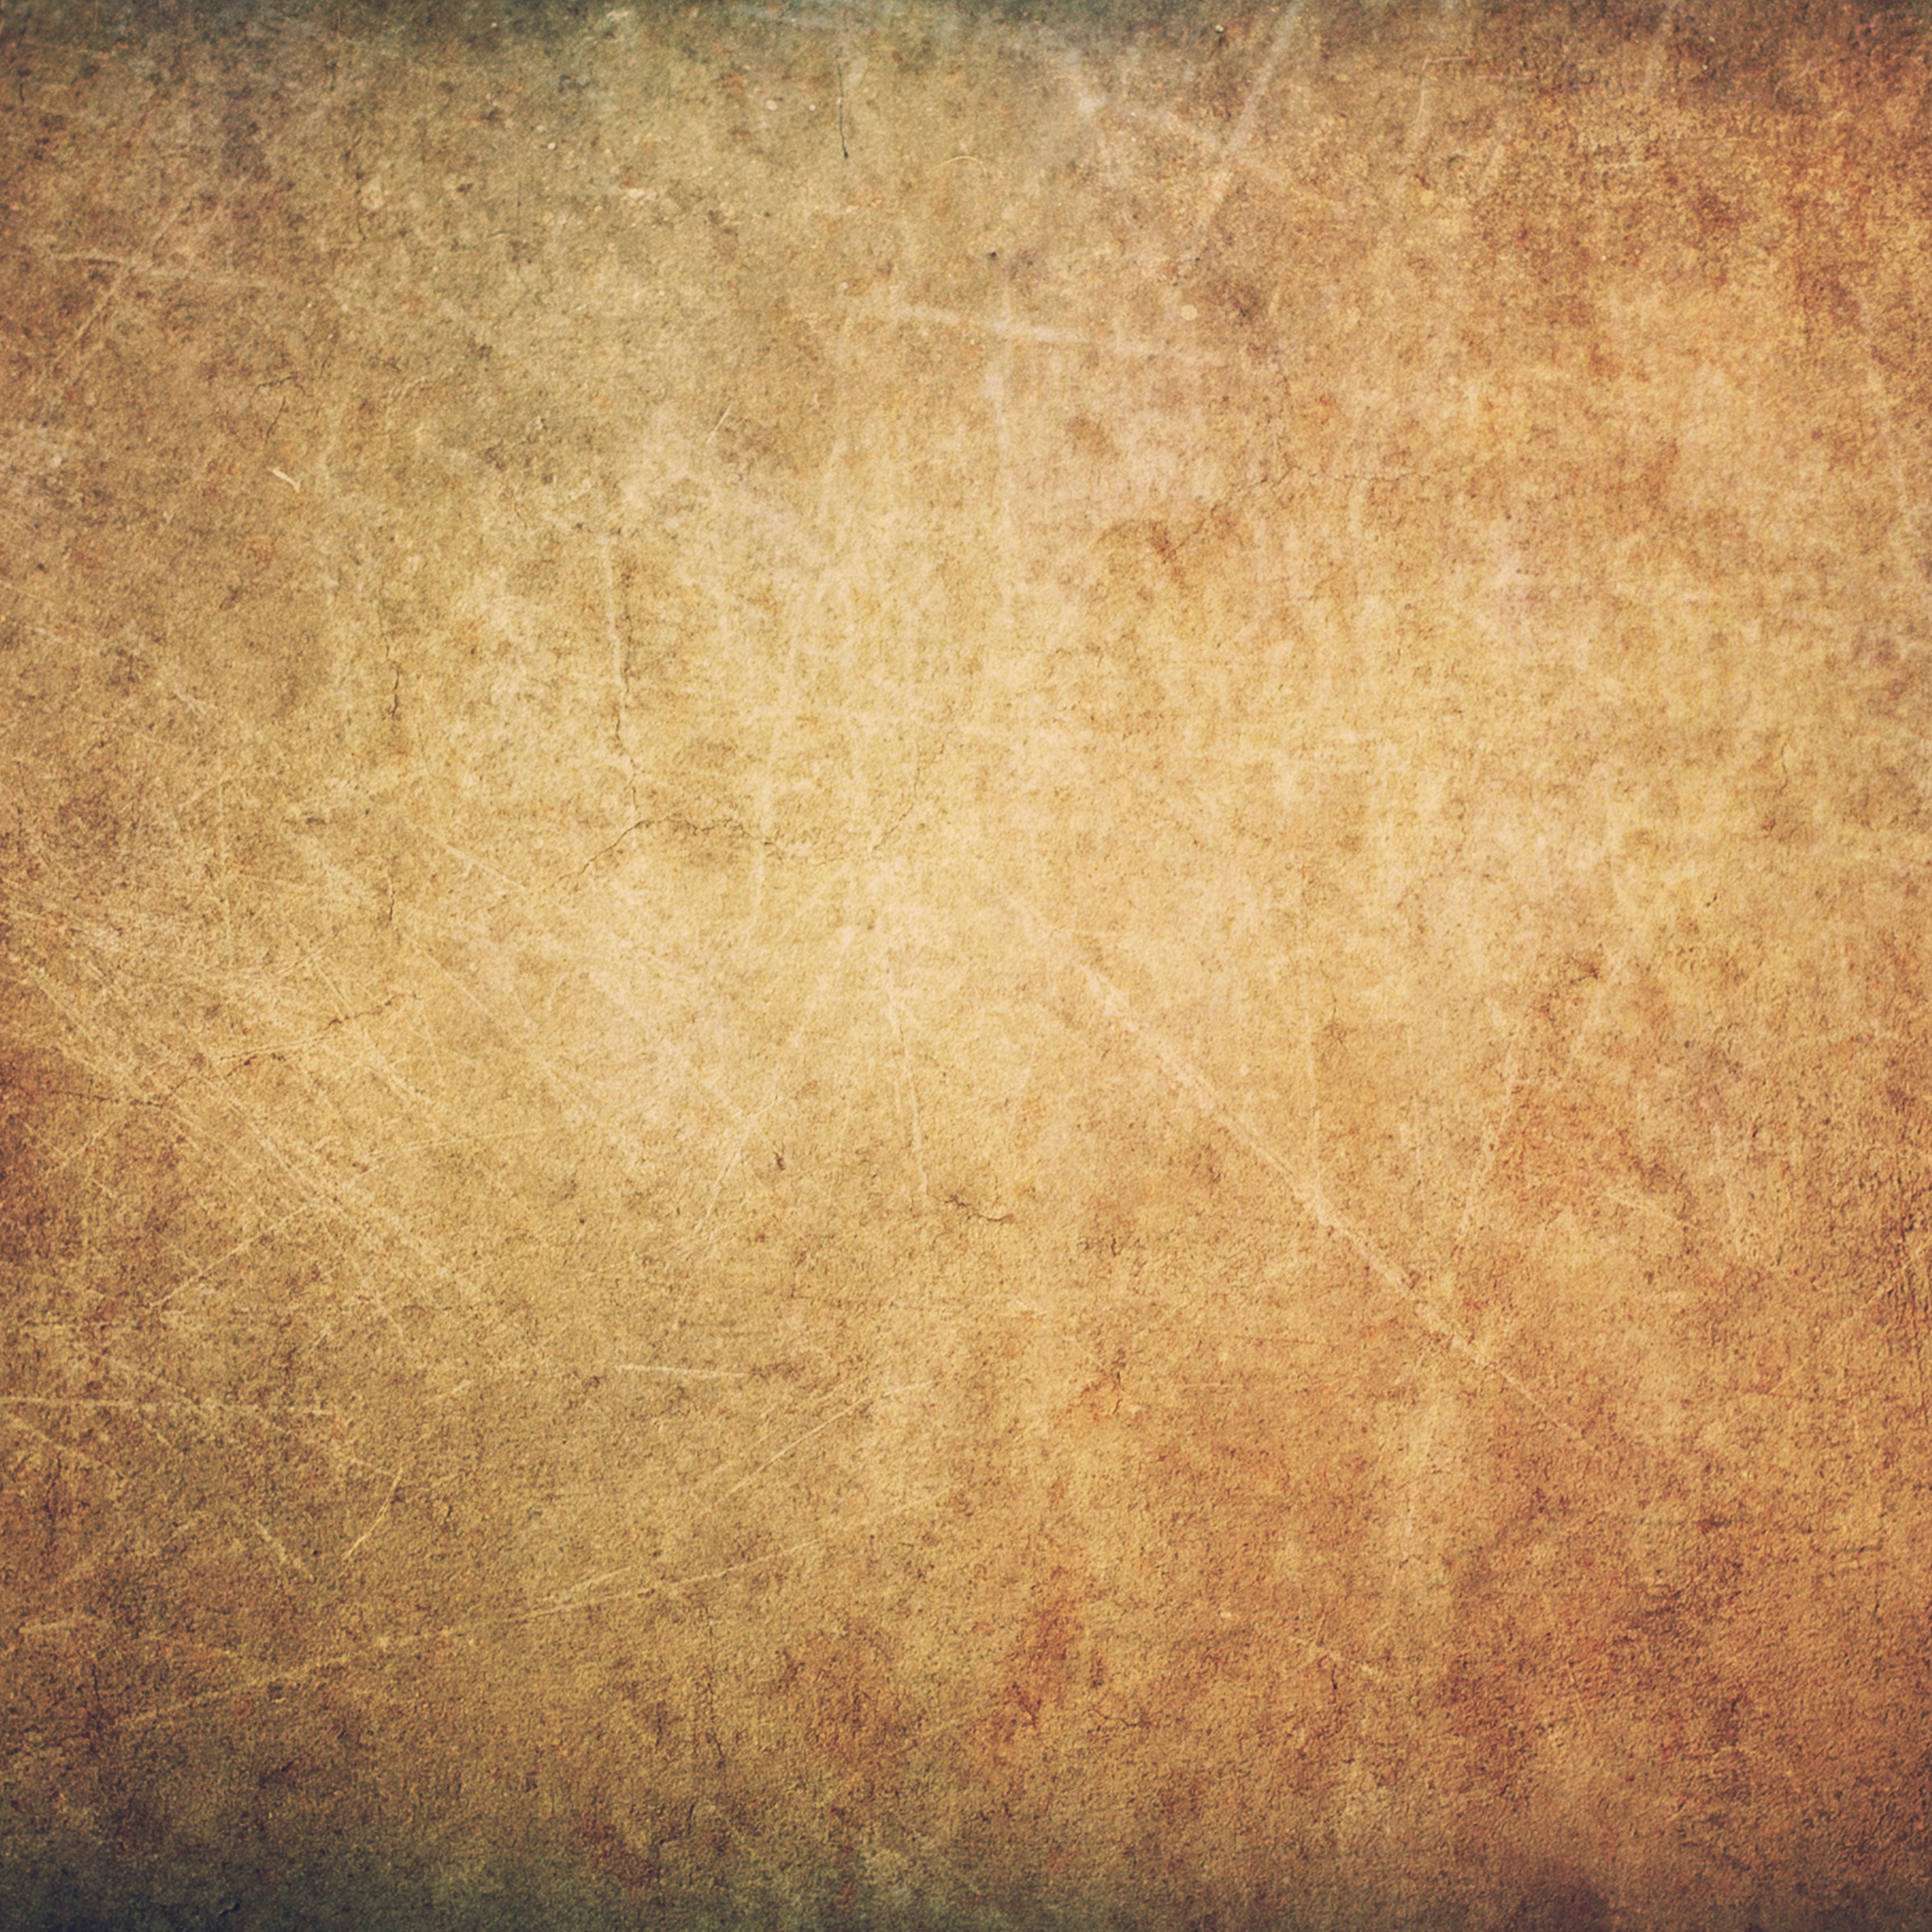 Beibehang Large Custom Wall Paper Cool Metal Texture: Grunge Watercolor Background